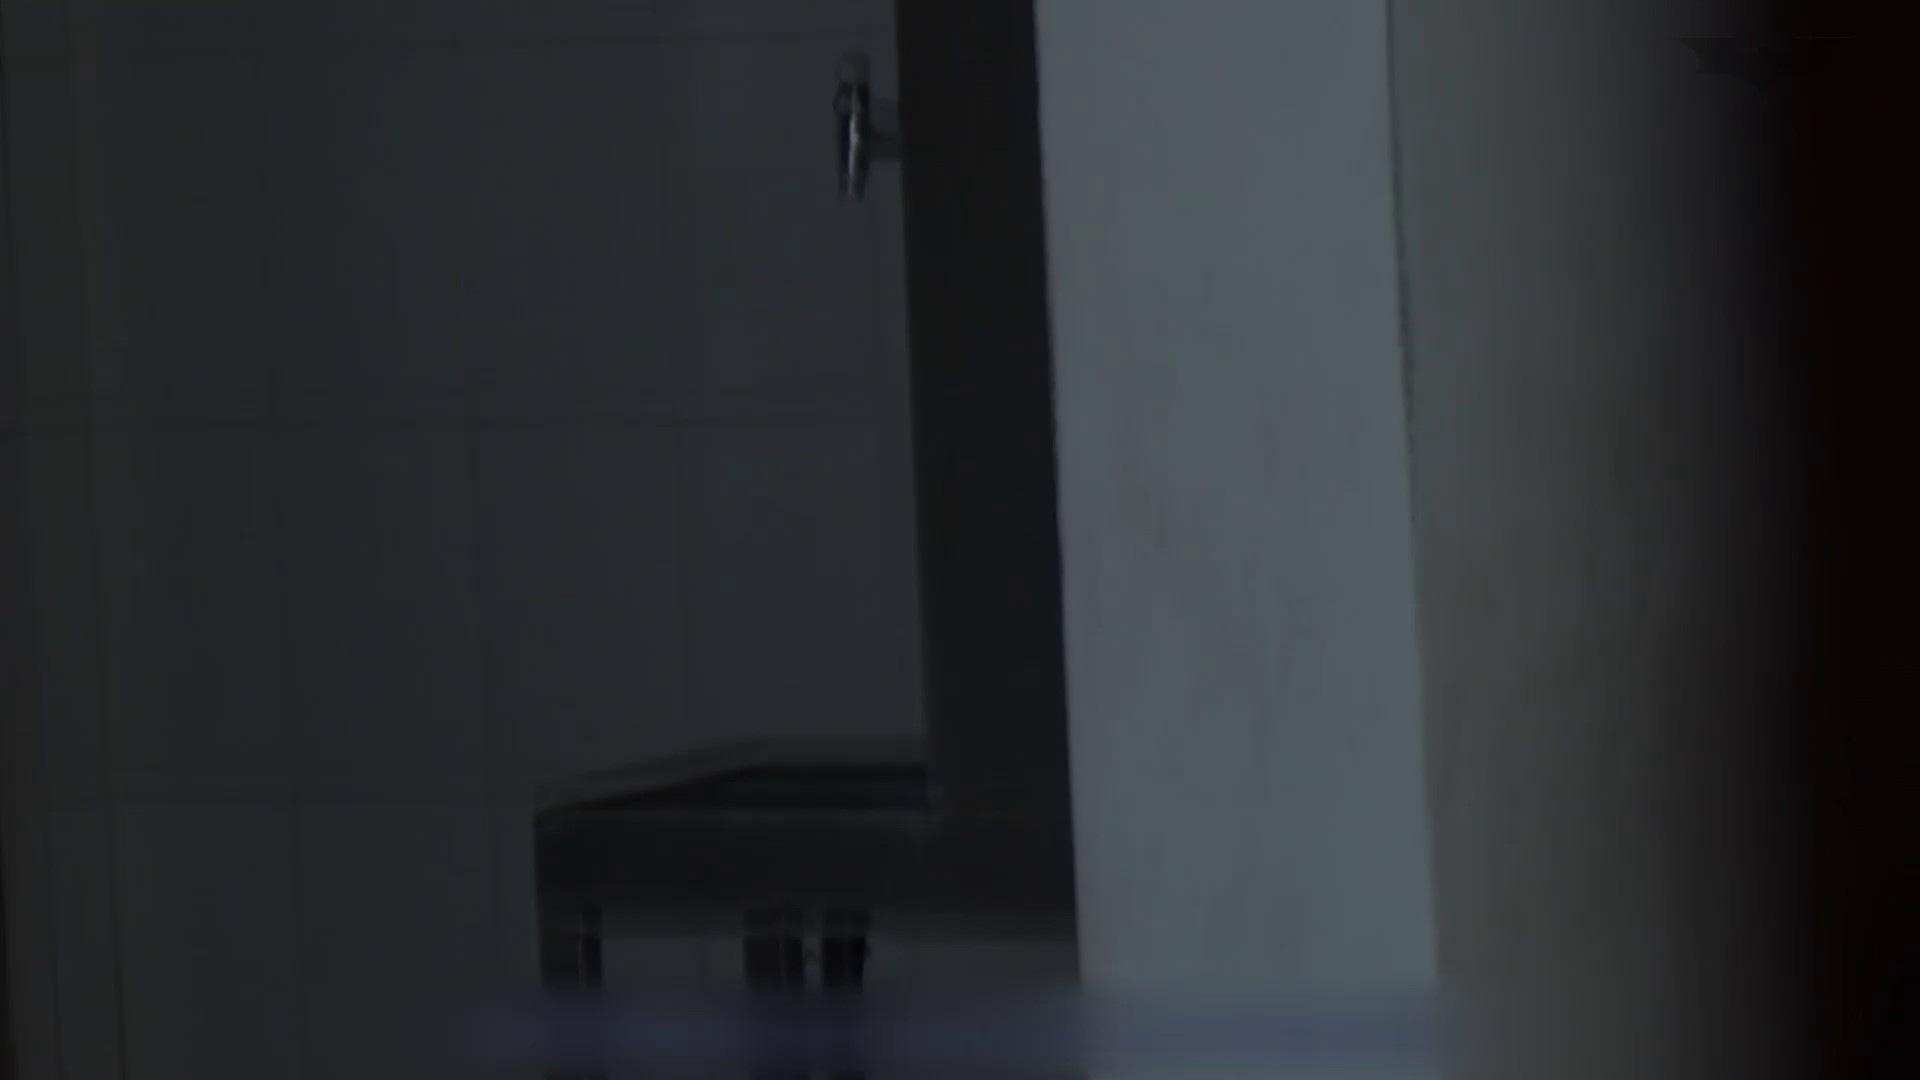 JD盗撮 美女の洗面所の秘密 Vol.52 細身女性 ワレメ無修正動画無料 48画像 15